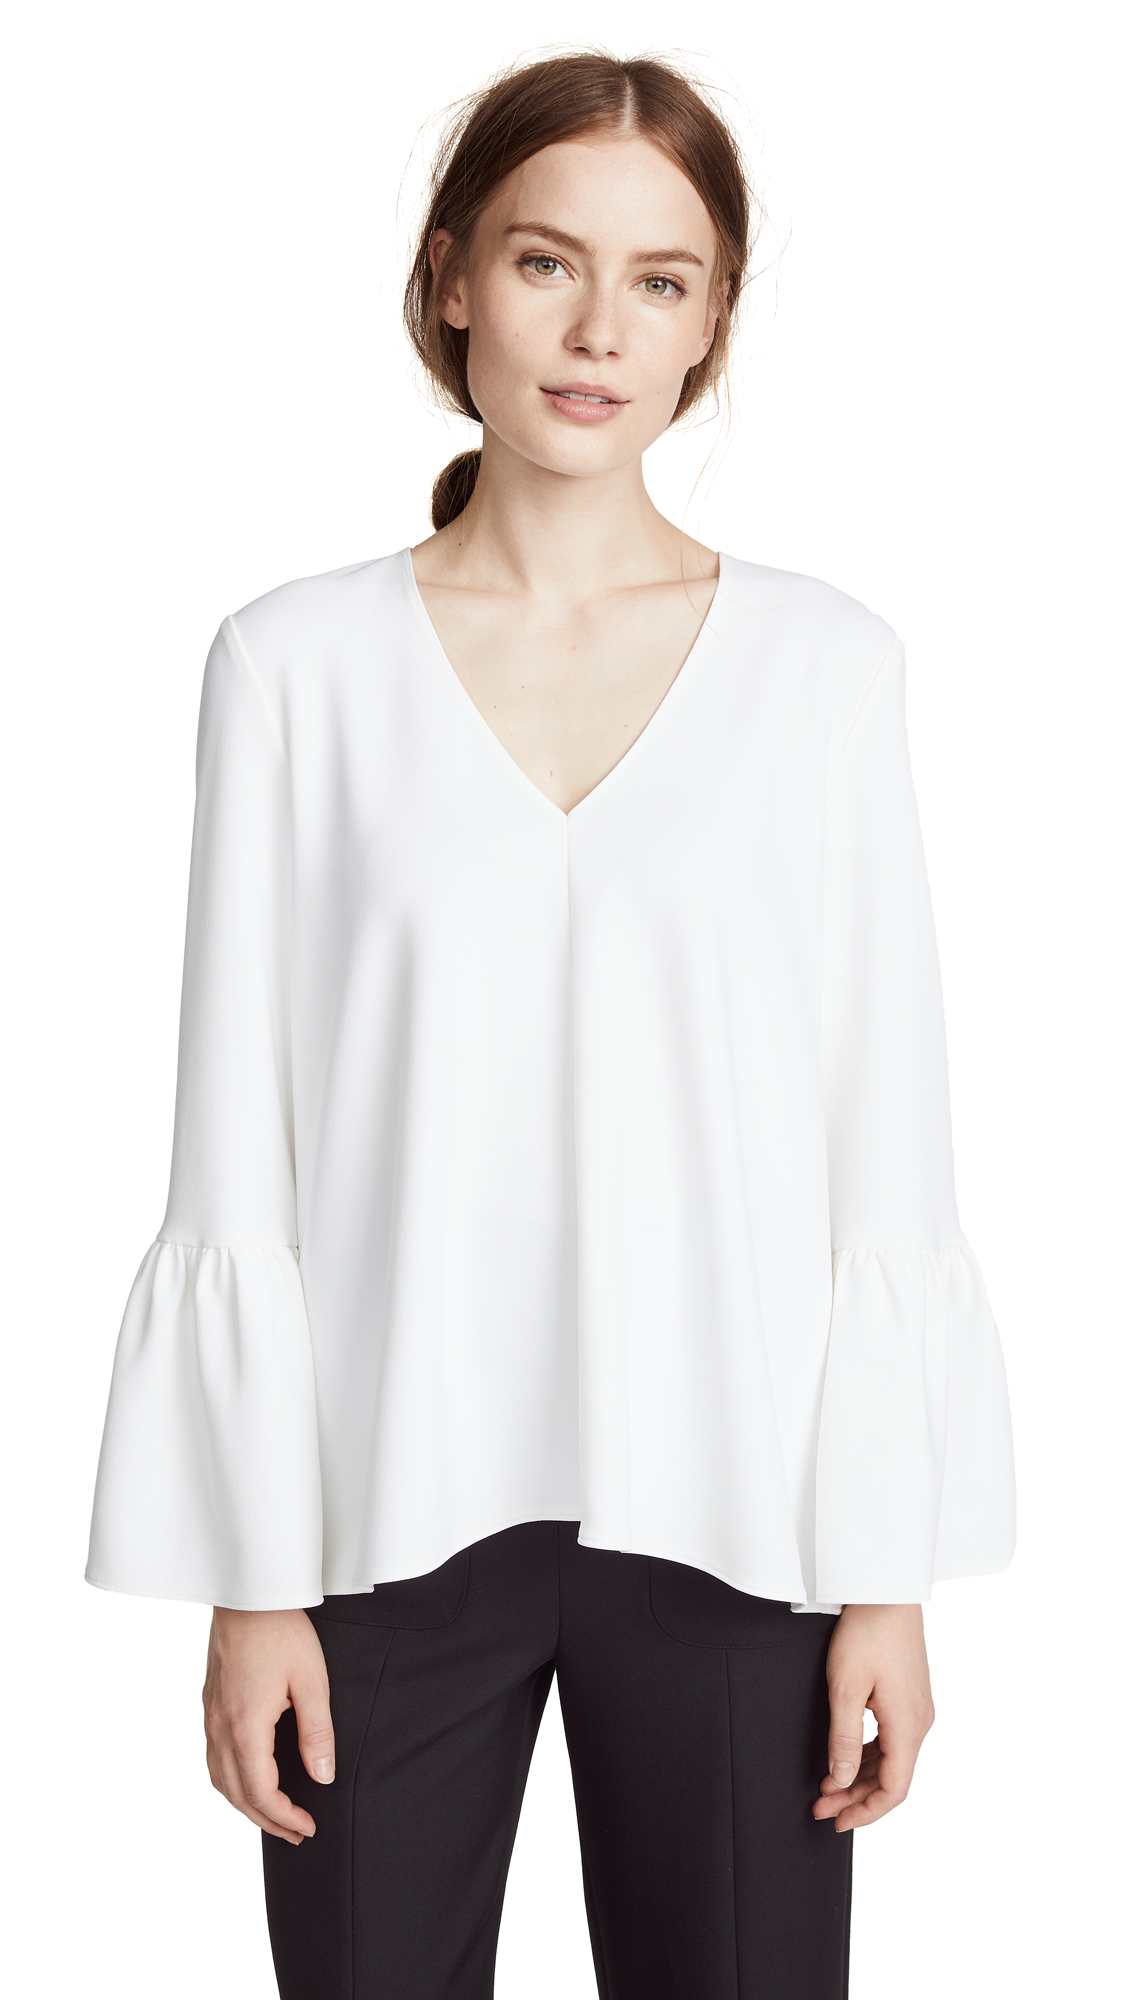 Tibi Ruffle Sleeve Top - White